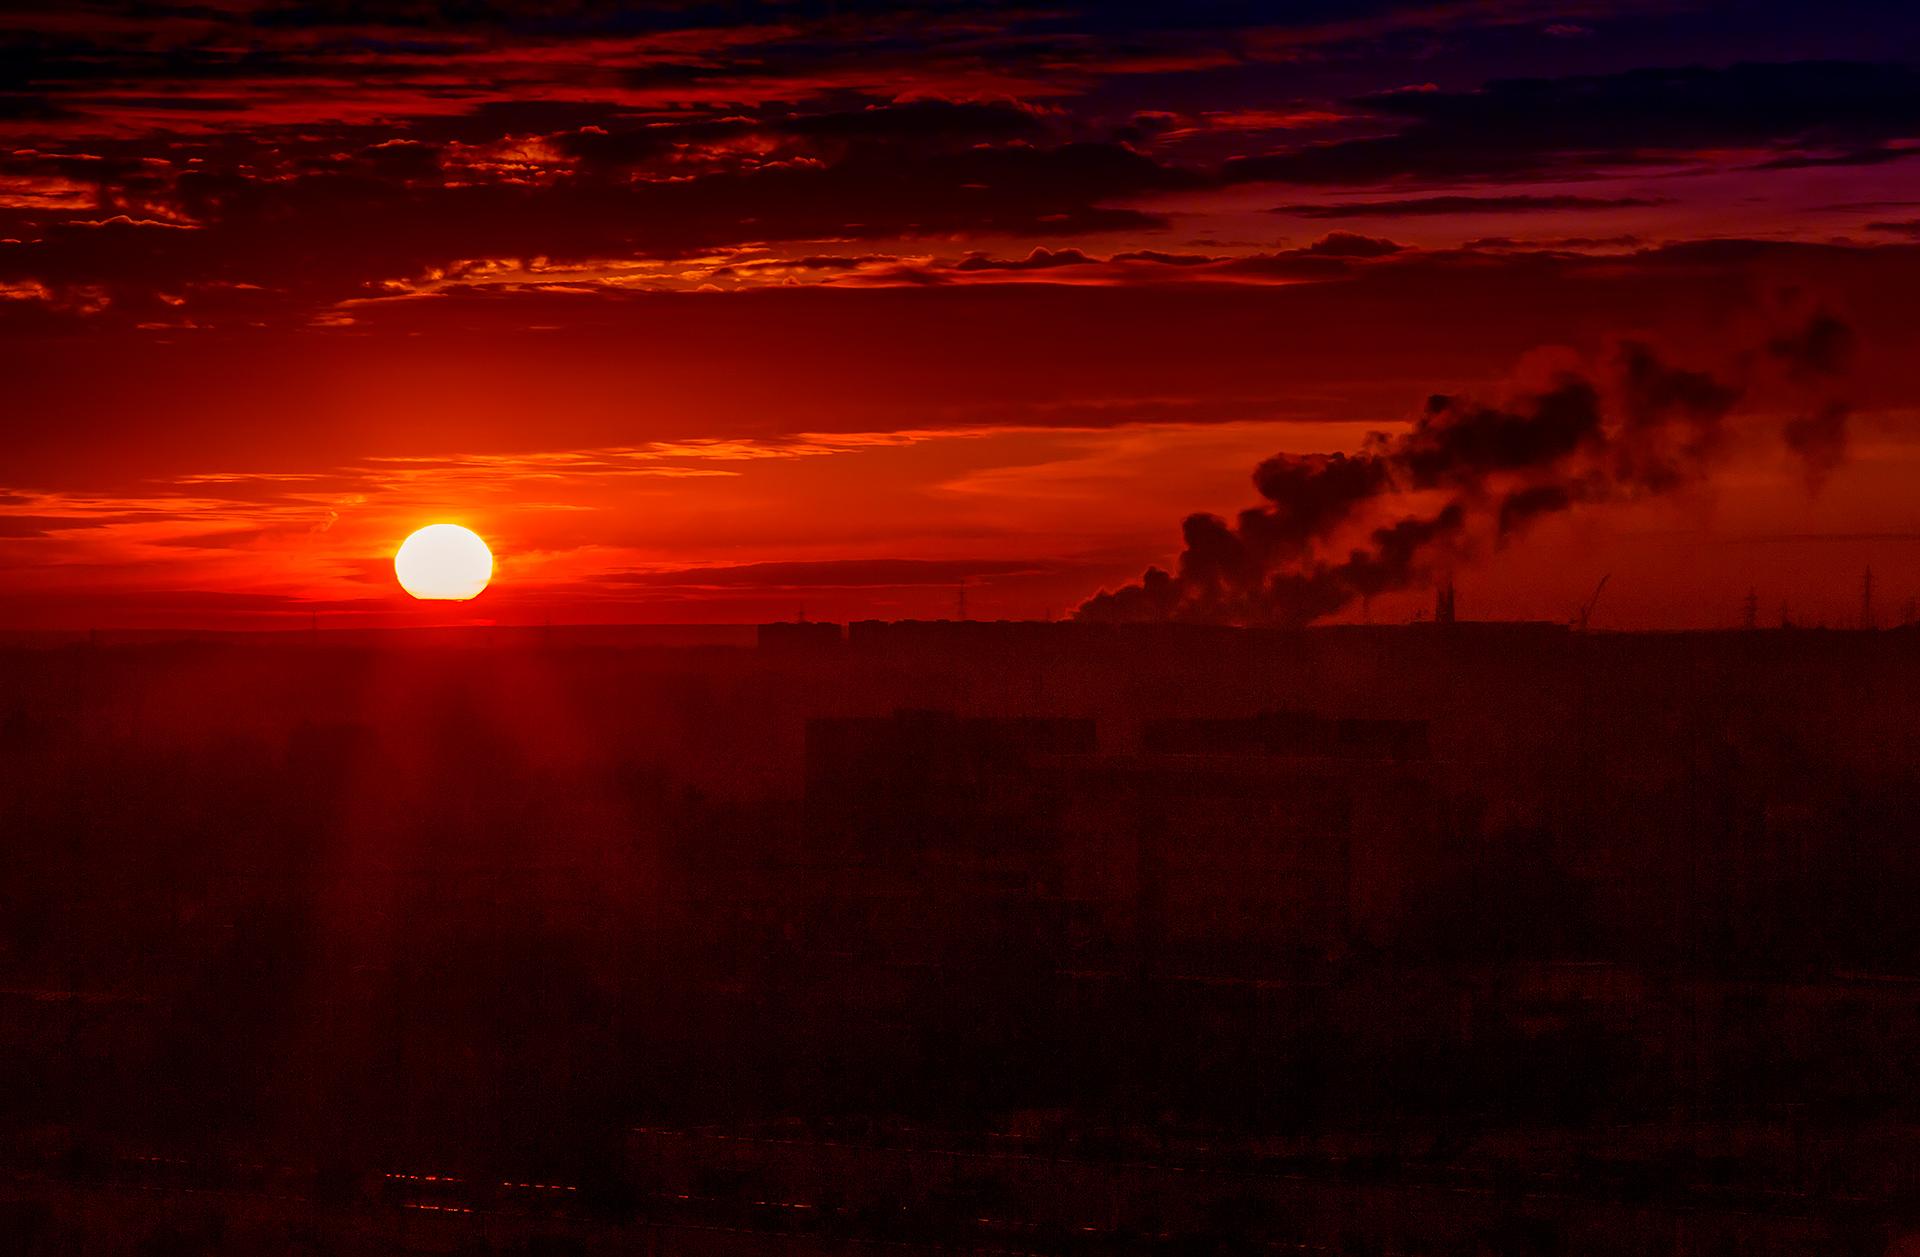 Sunset, Almaty, View, Almaty, smoke, smog, Kazakhstan, urban, architecture